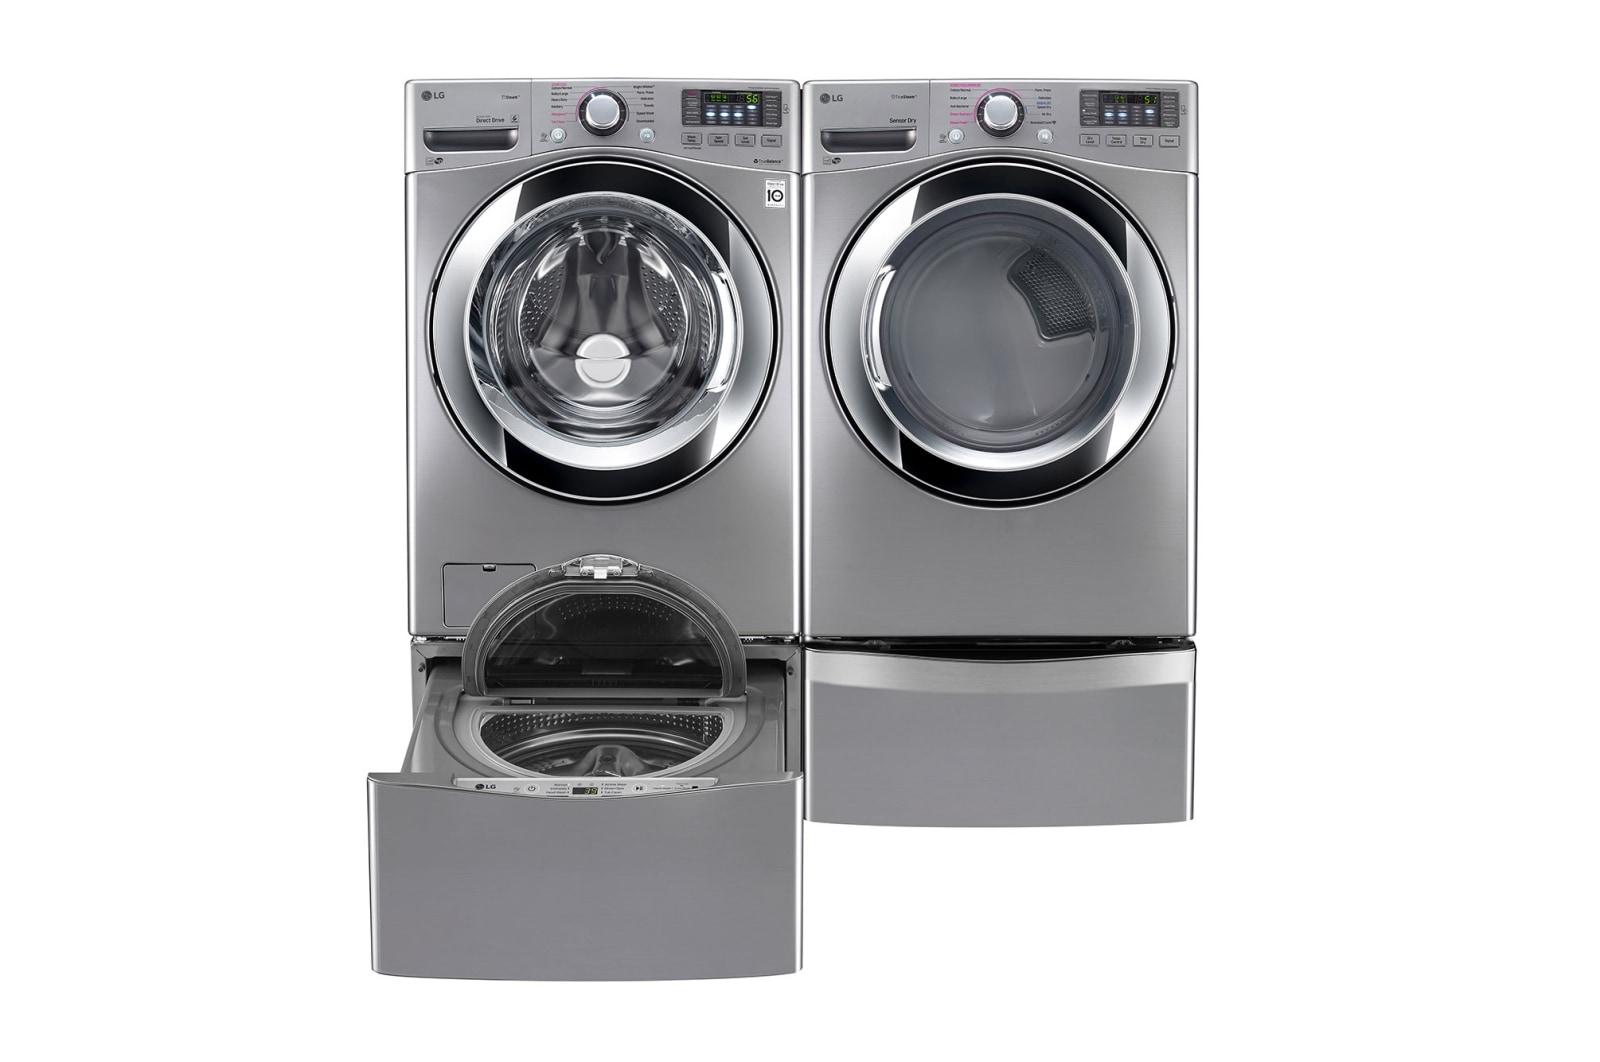 Lg Front Load Washers Wm4270hva 5 2 Cu Ft Ultra Large